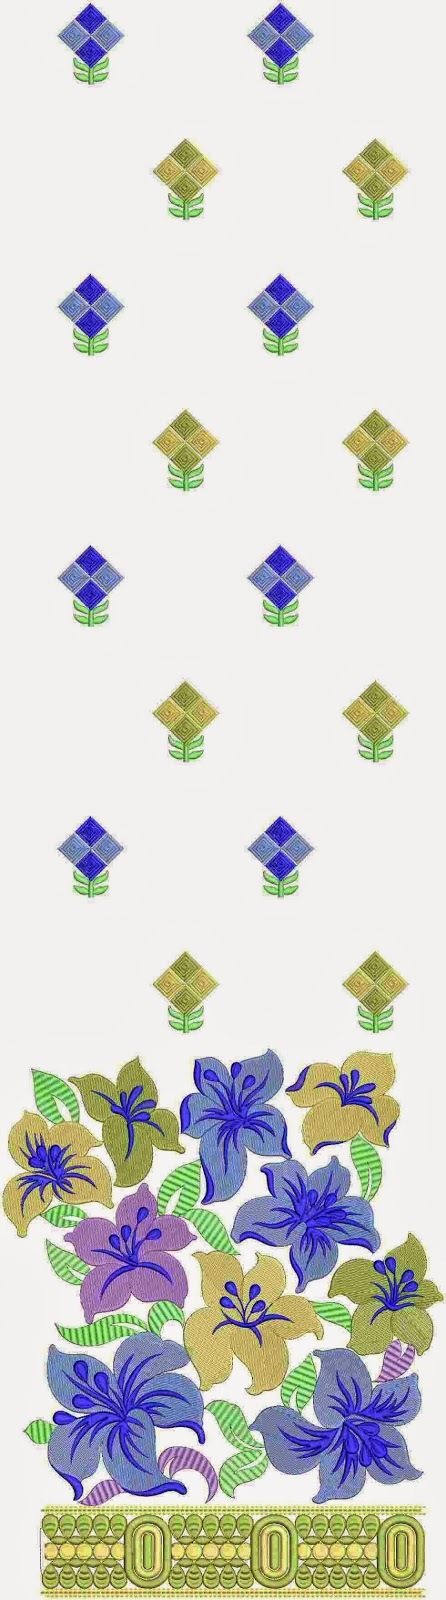 Golden Kasab draad naaldwerk veelkleurige Lawn pak